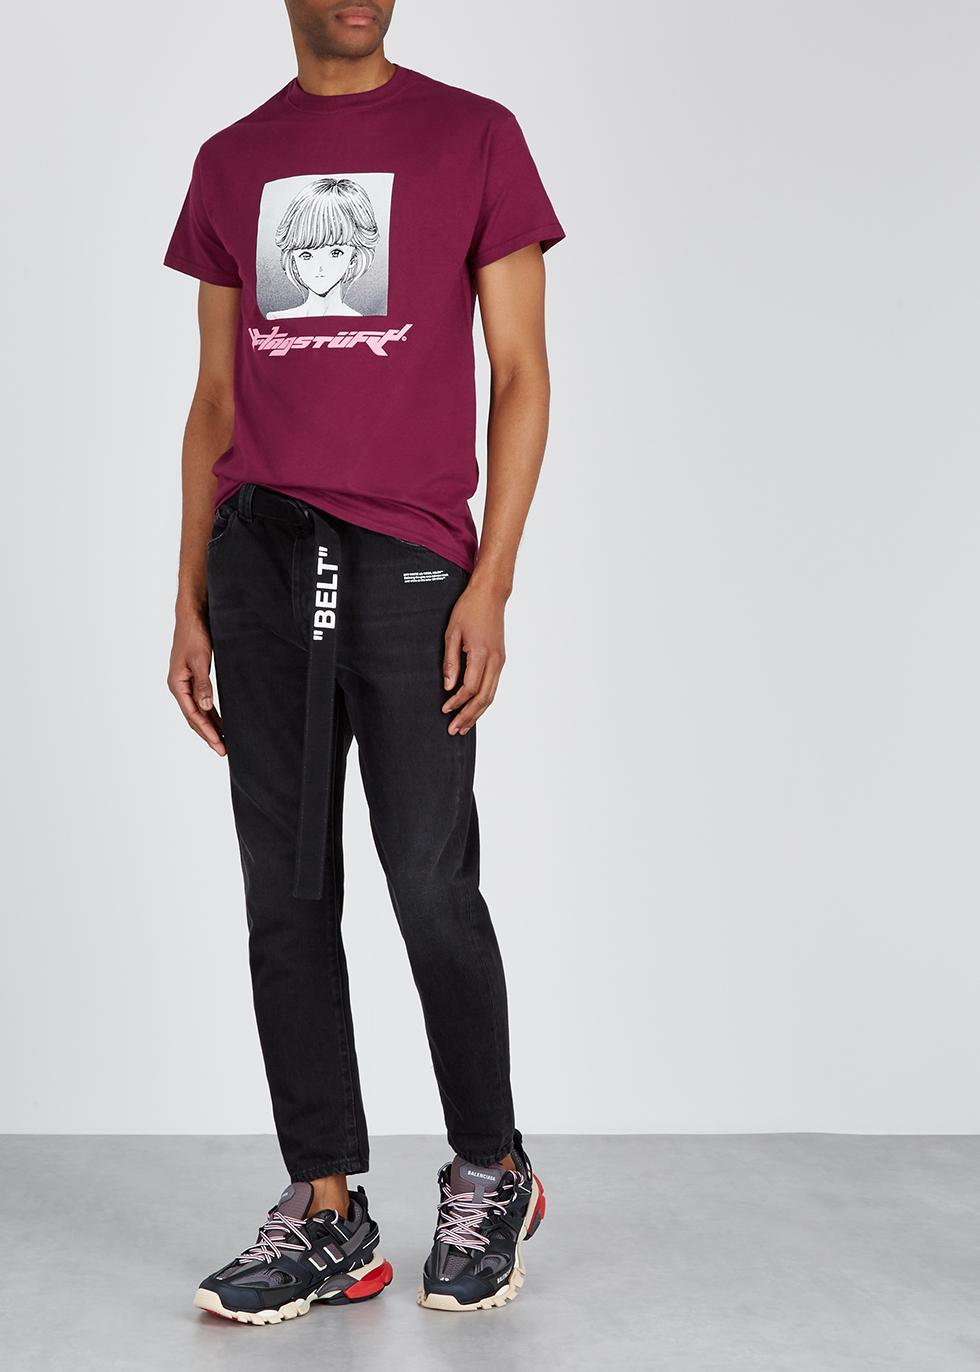 Burgundy printed cotton T-shirt - Flagstuff